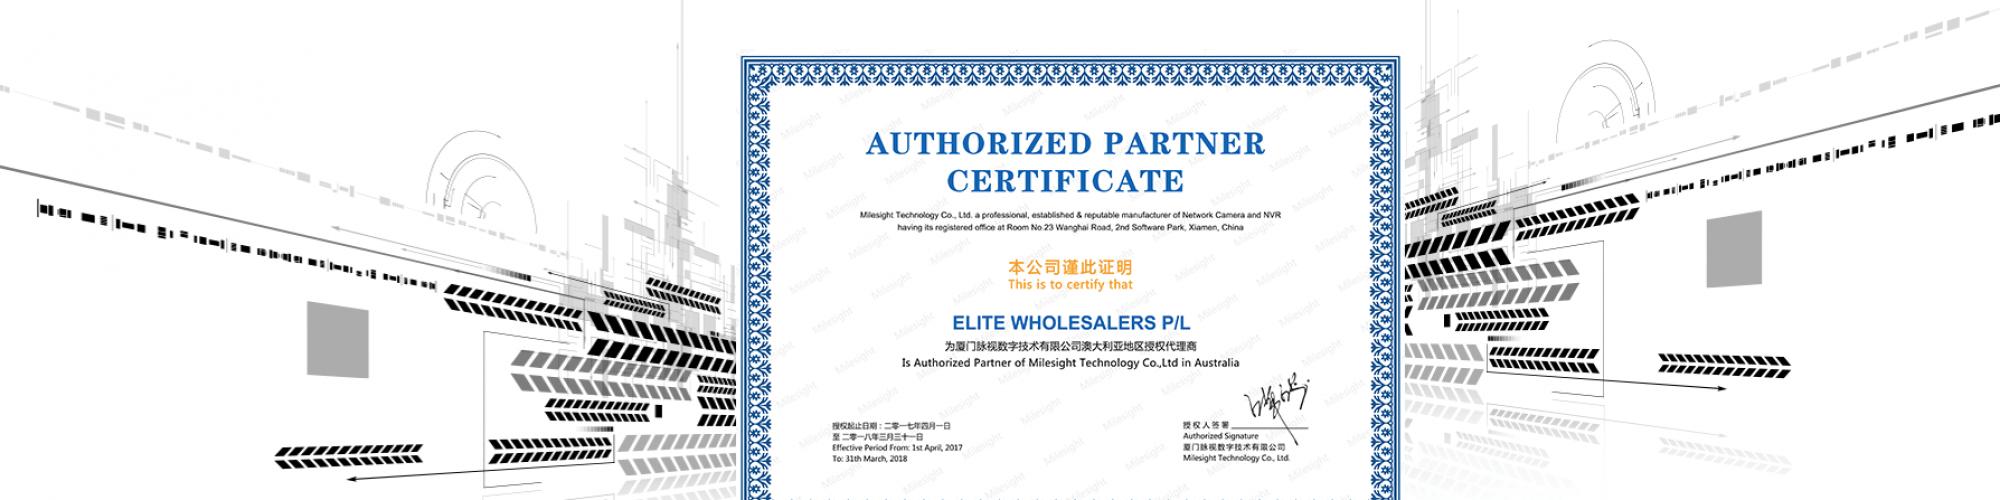 Elite Wholesalers Australia | StartUs